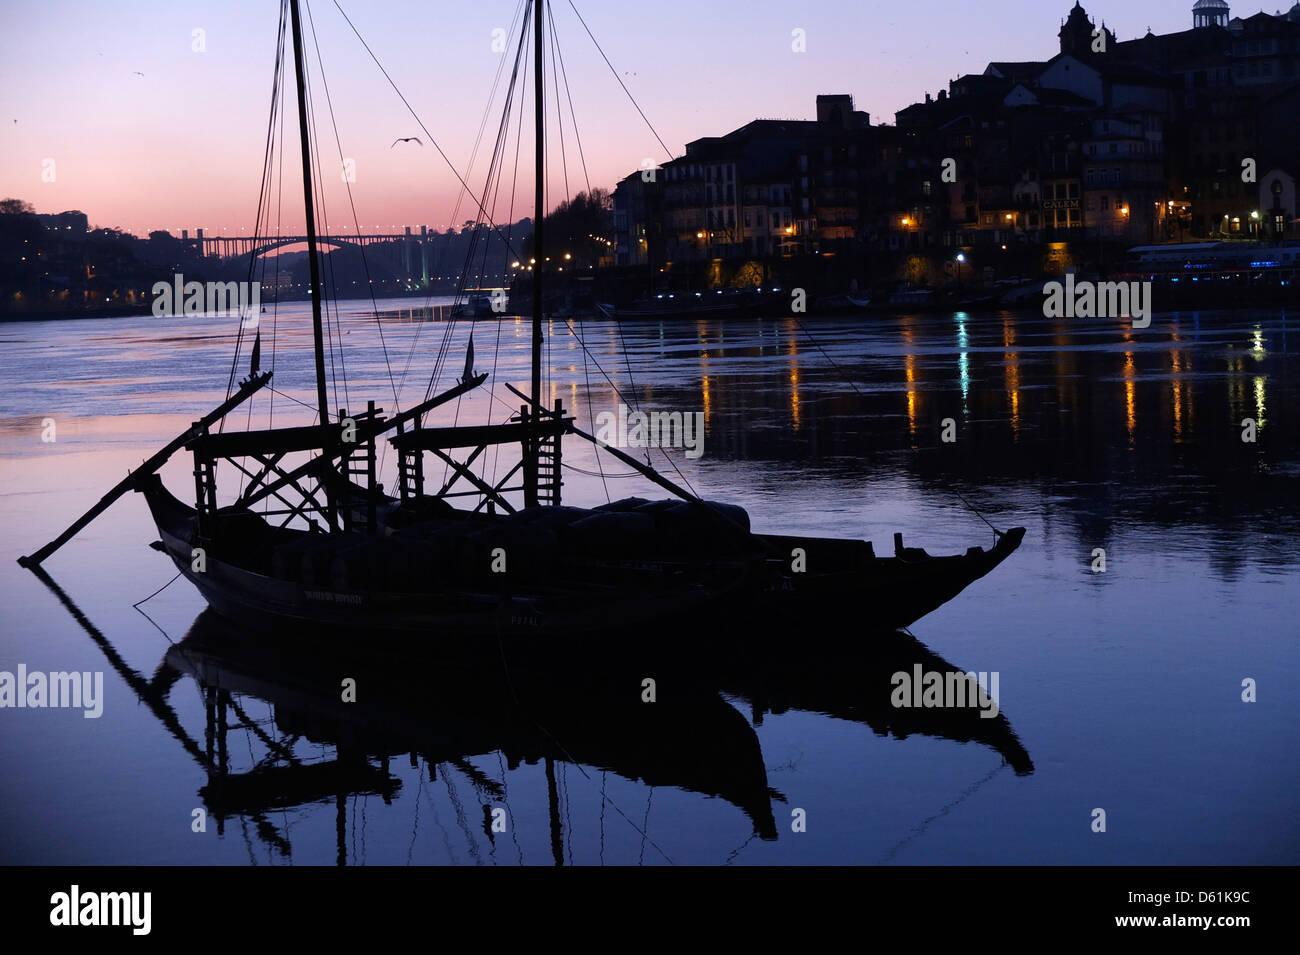 Portugal, Porto, view, Douro, River, Ribeira, - Stock Image